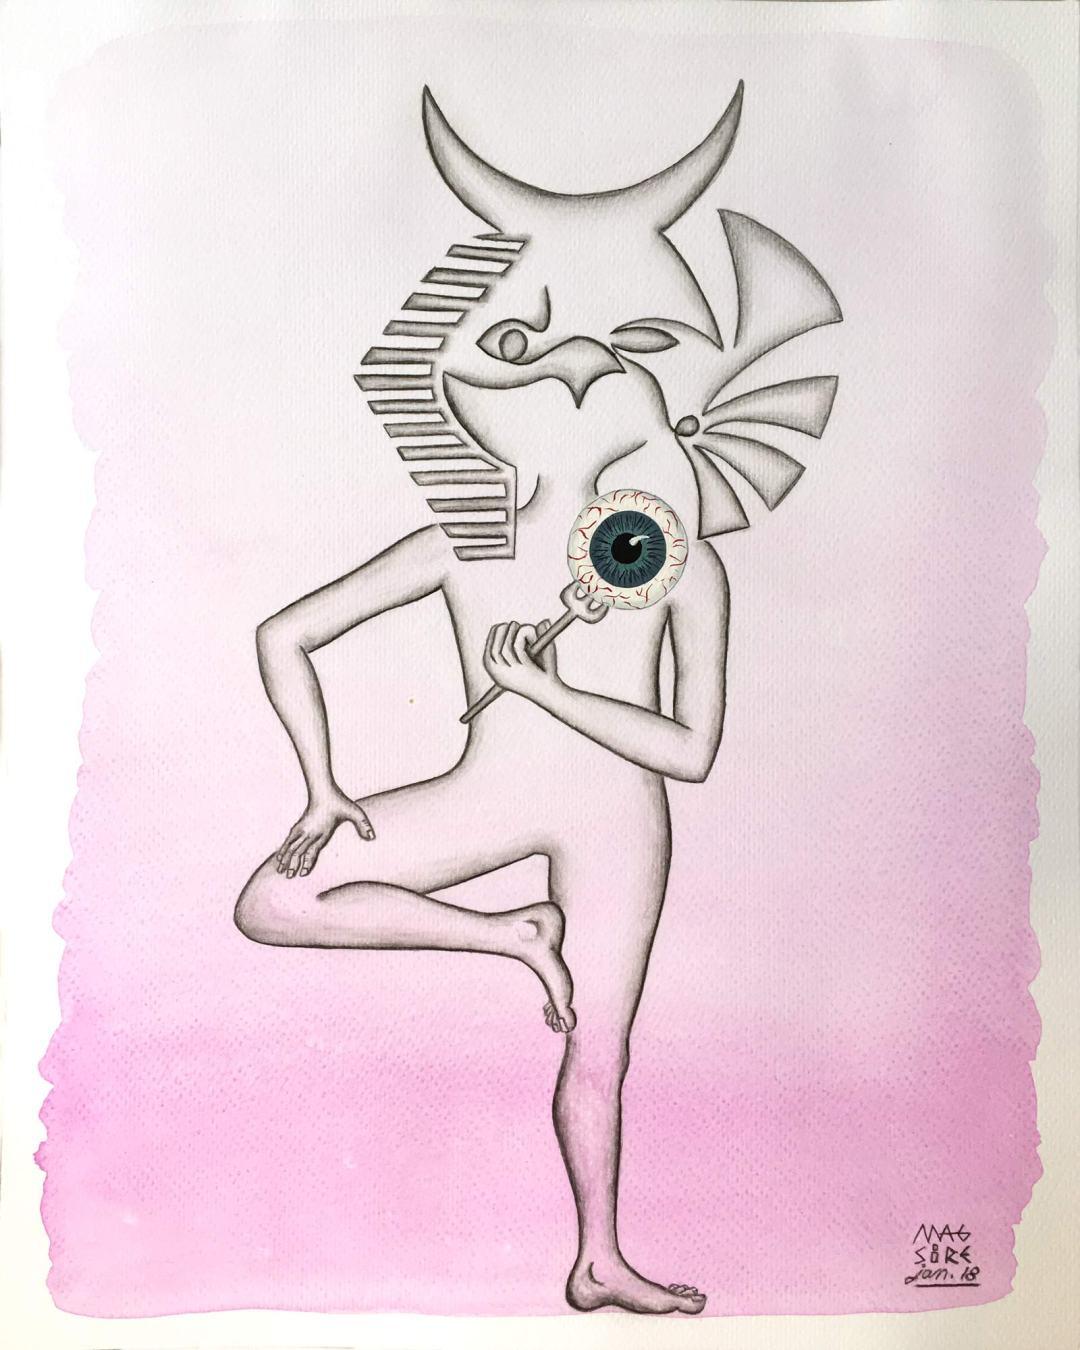 L'oeil d'Horus| 24 cm x 30 cm